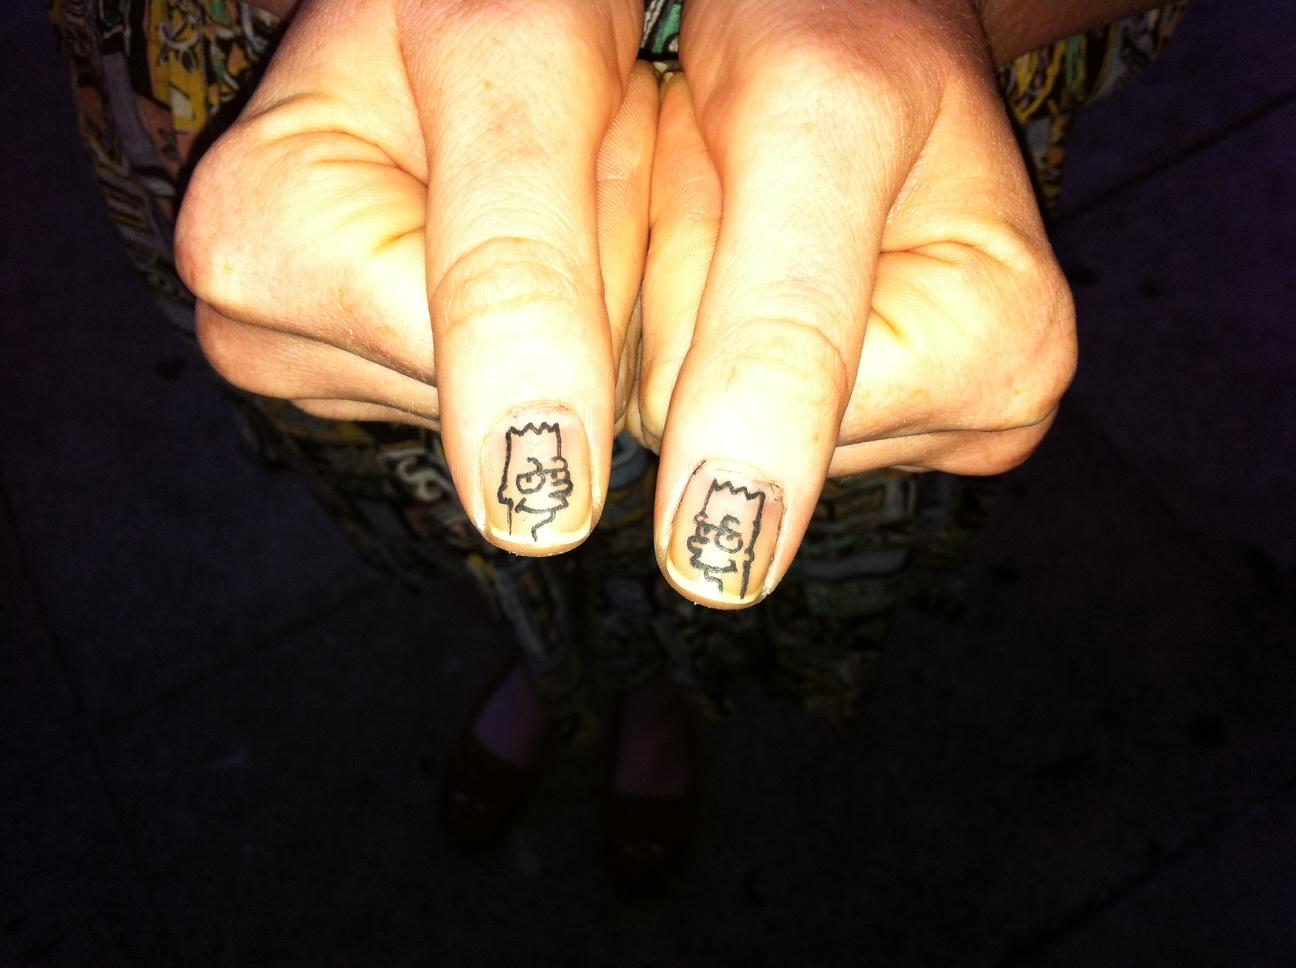 ... diamond, an eye, a pizza slice, a smiley face, a dollar sign and a